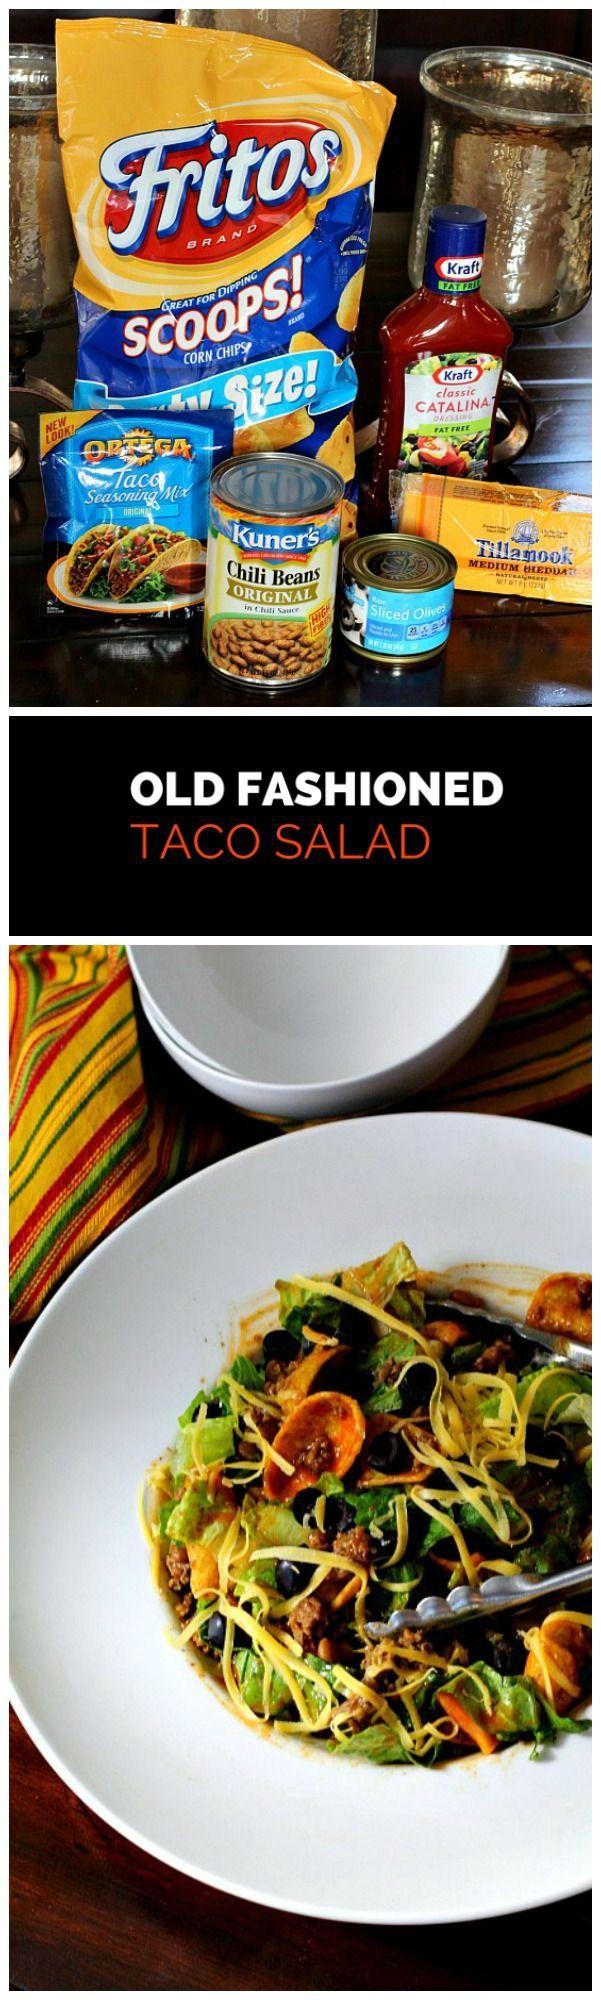 Taco salad catalina dressing recipes